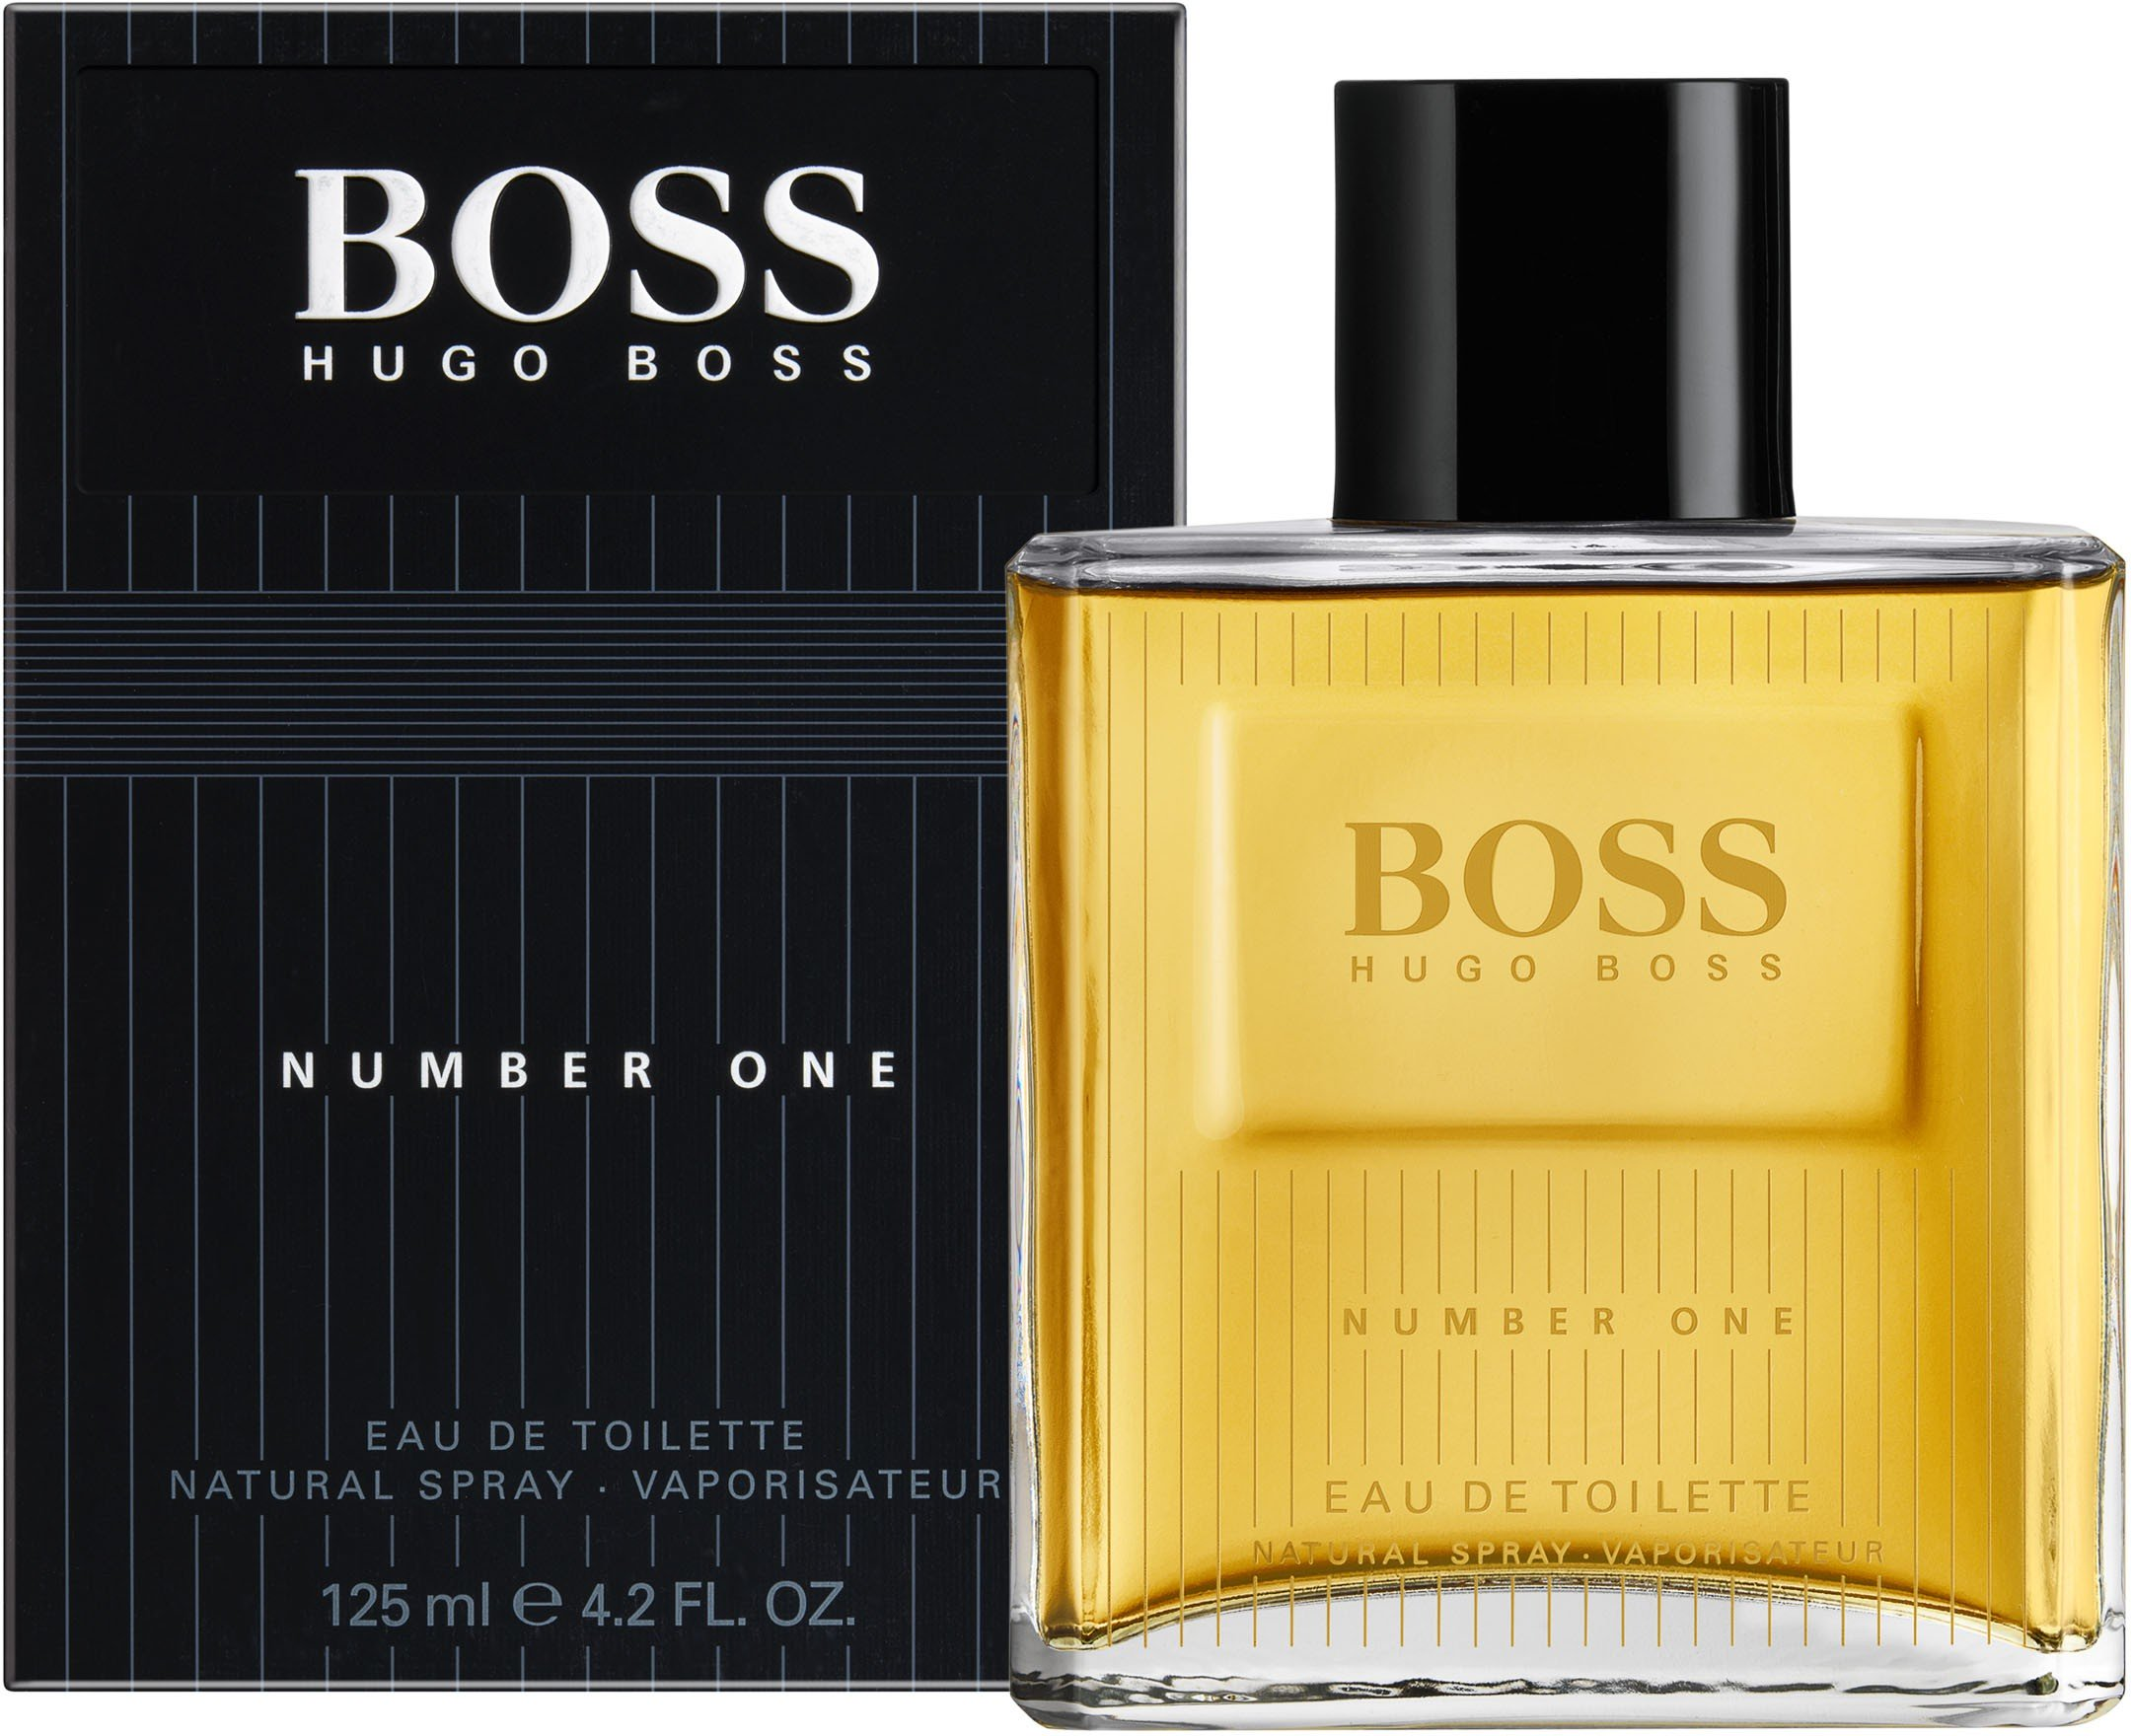 711ce4c2fa HUGO BOSS NUMBER ONE MEN EDT 125ML - Perfume for Bangladesh